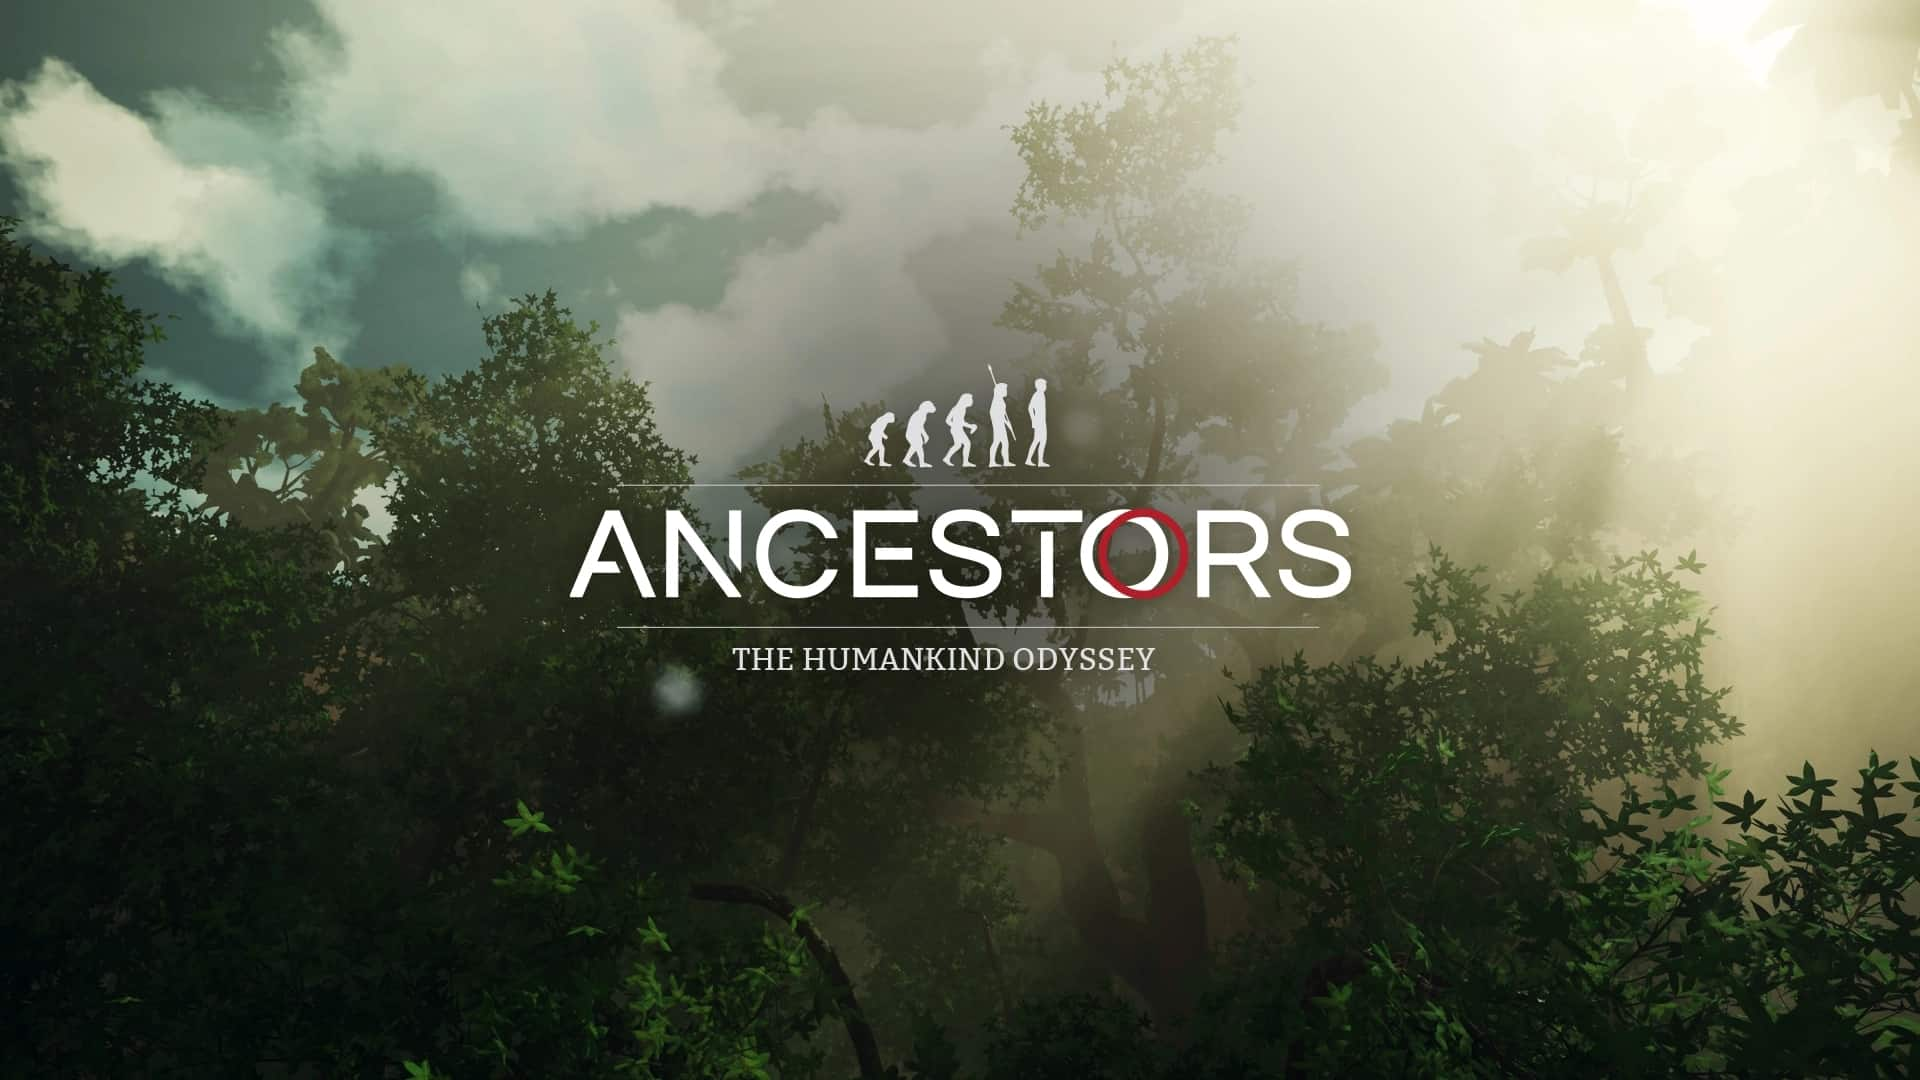 Ancestors trailer